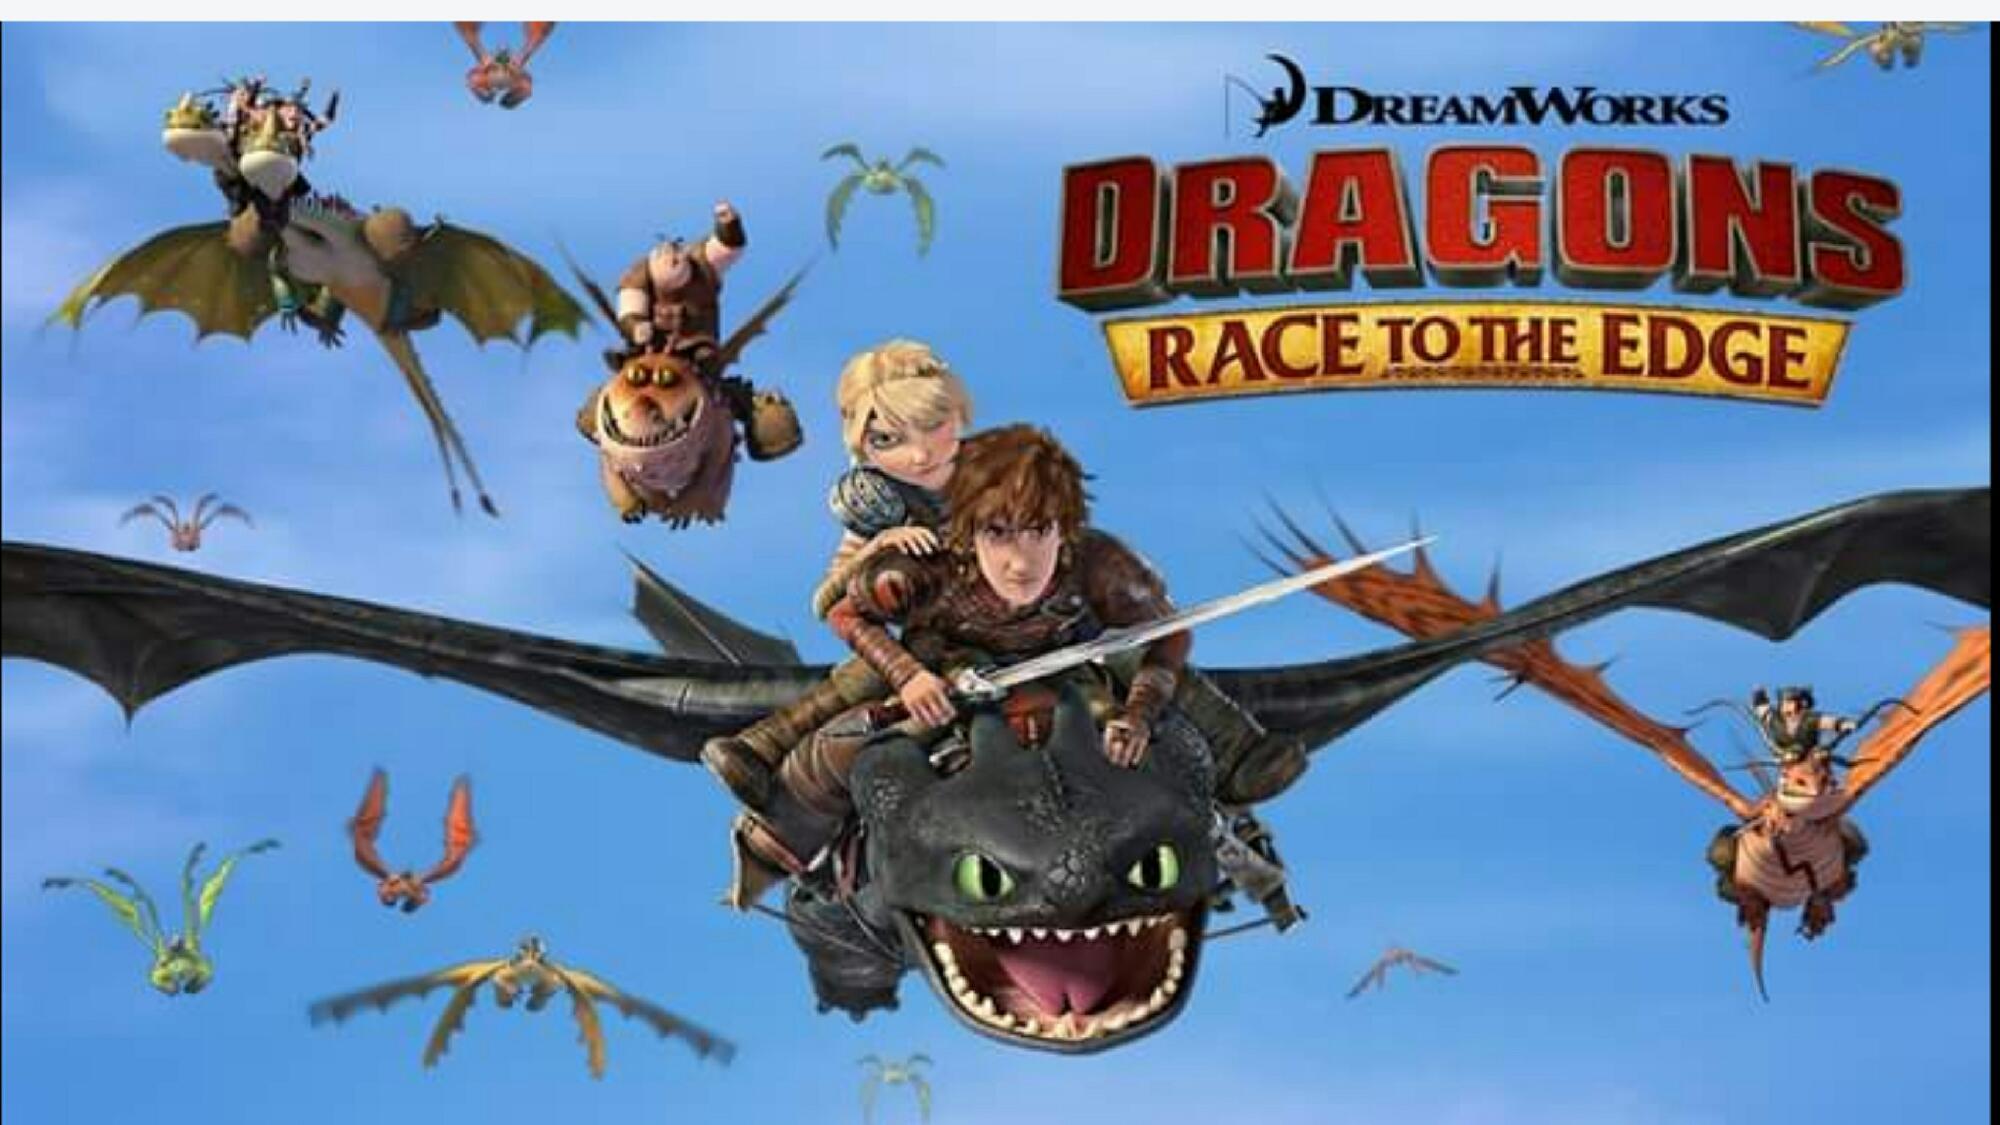 Dragons race to the edge season 6 2018